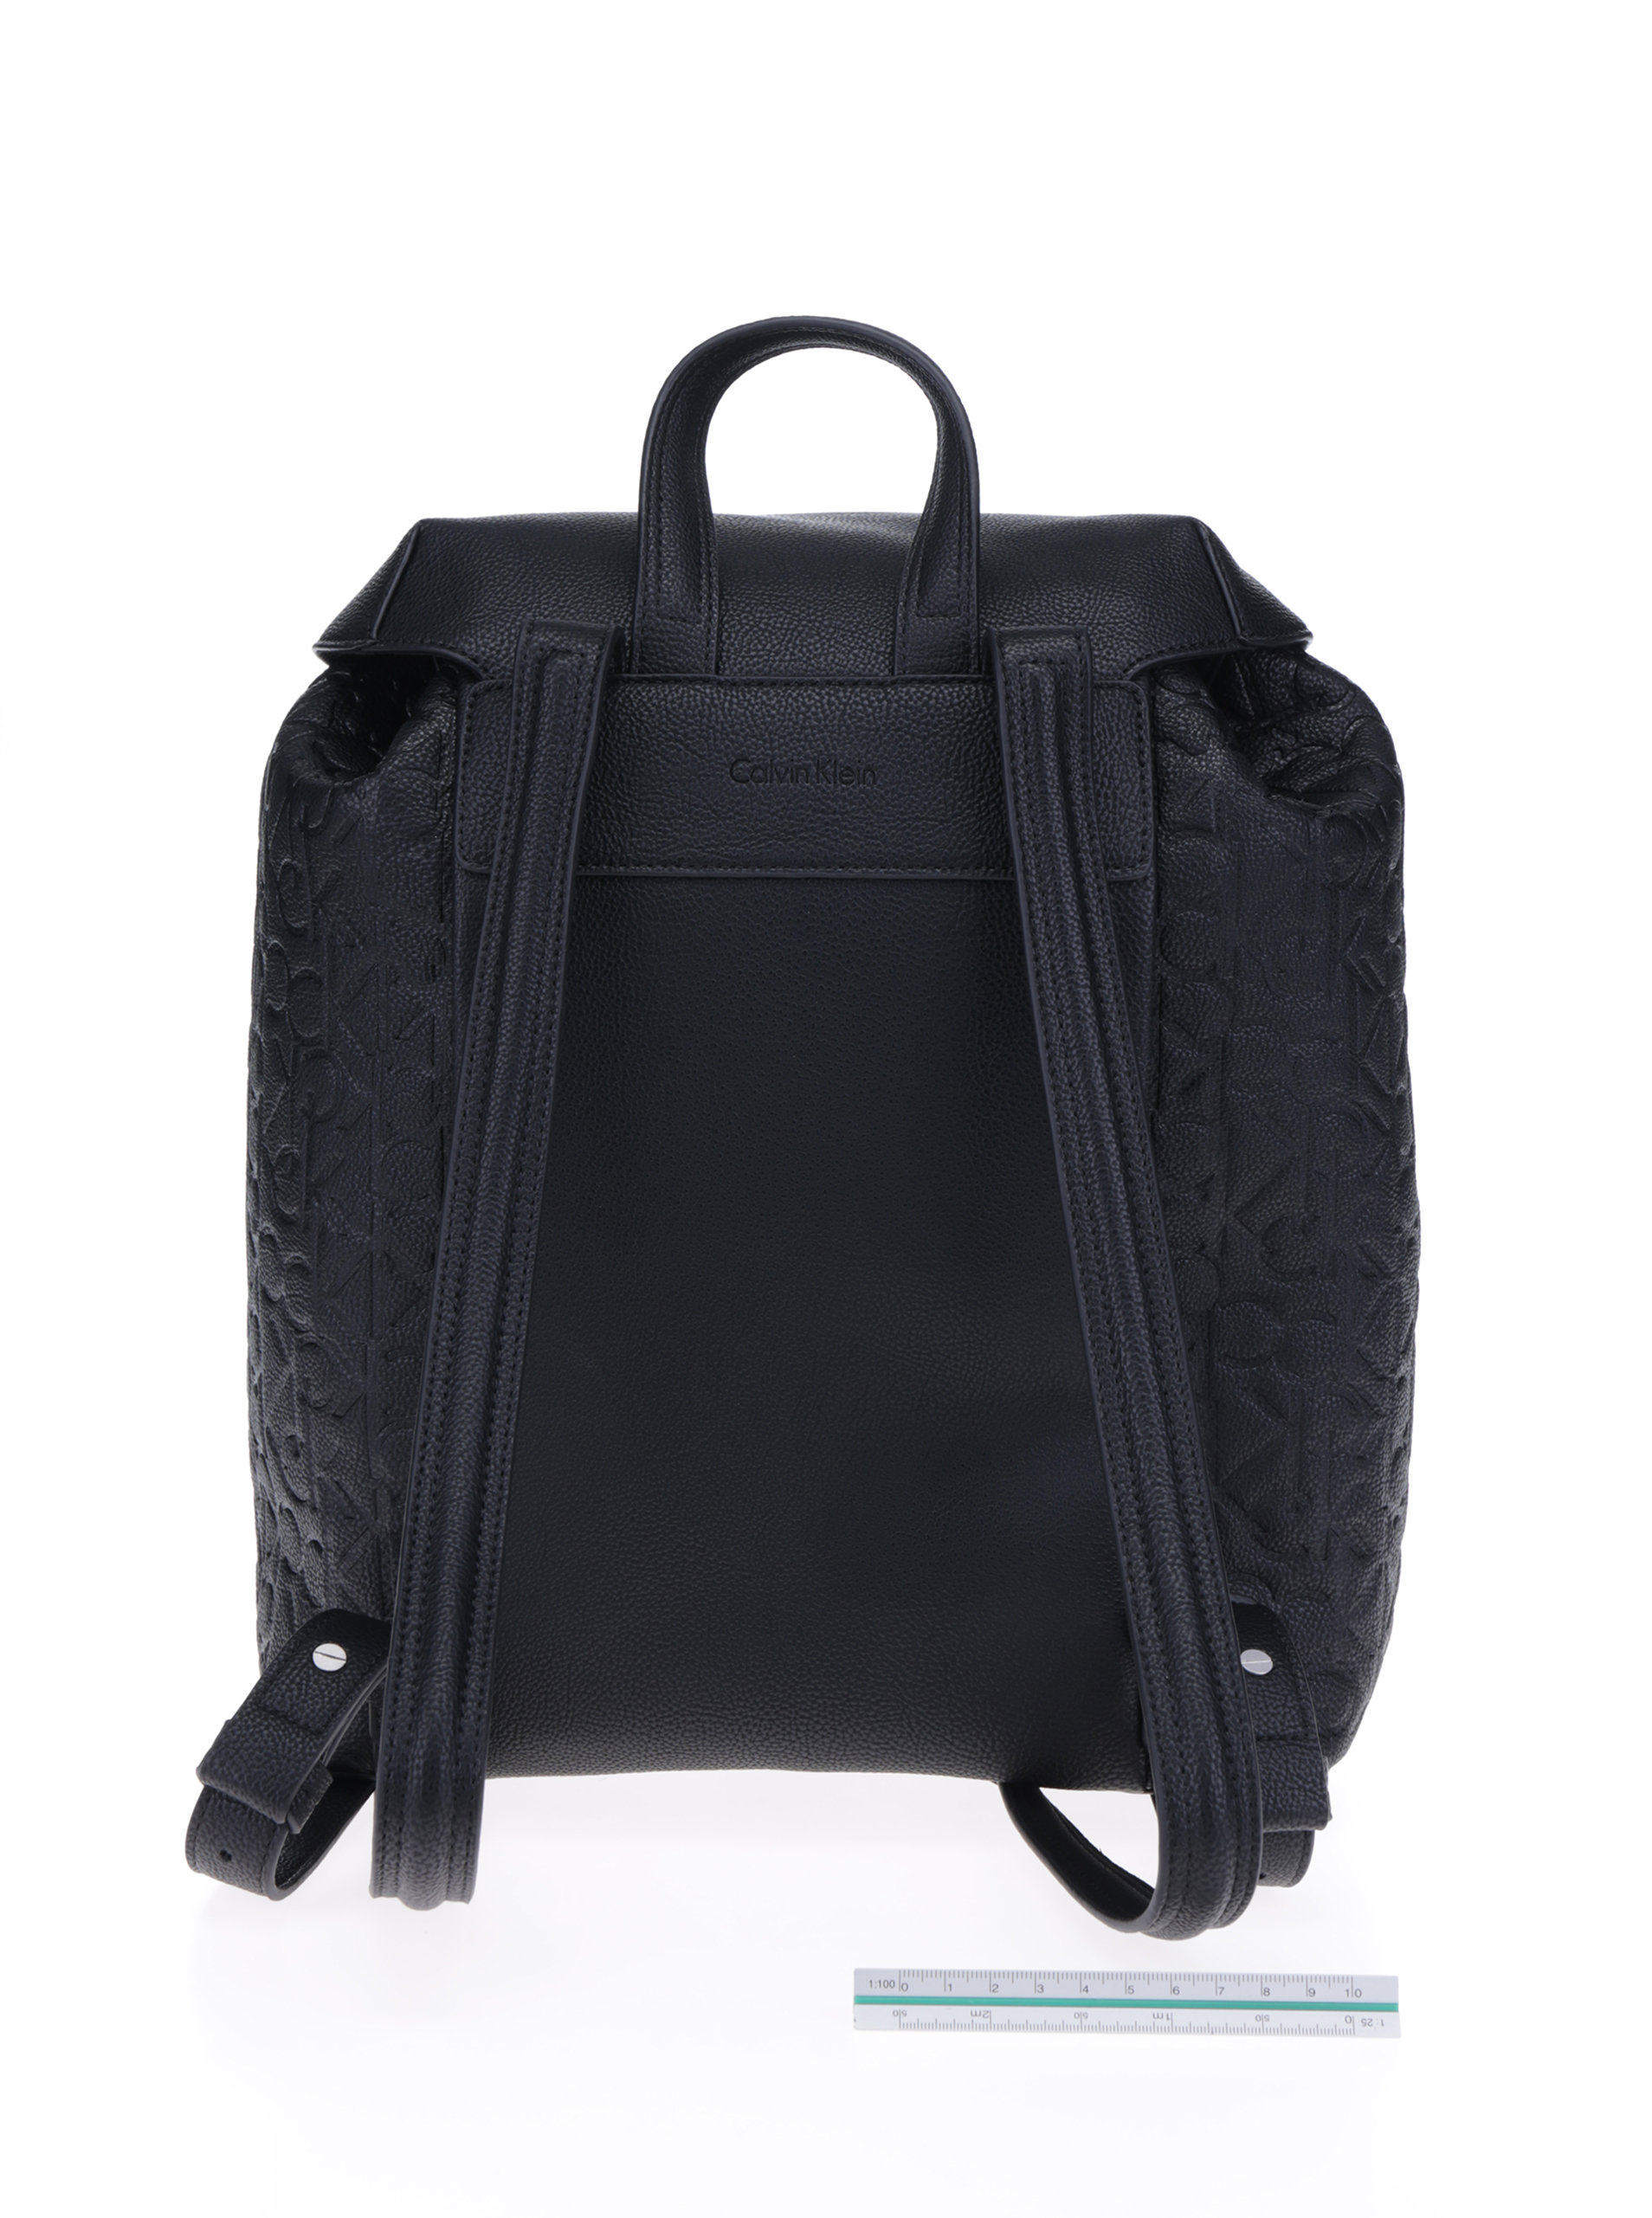 318d5fb740 Černý dámský batoh se strukturovanými detaily Calvin Klein Jeans Misha ...